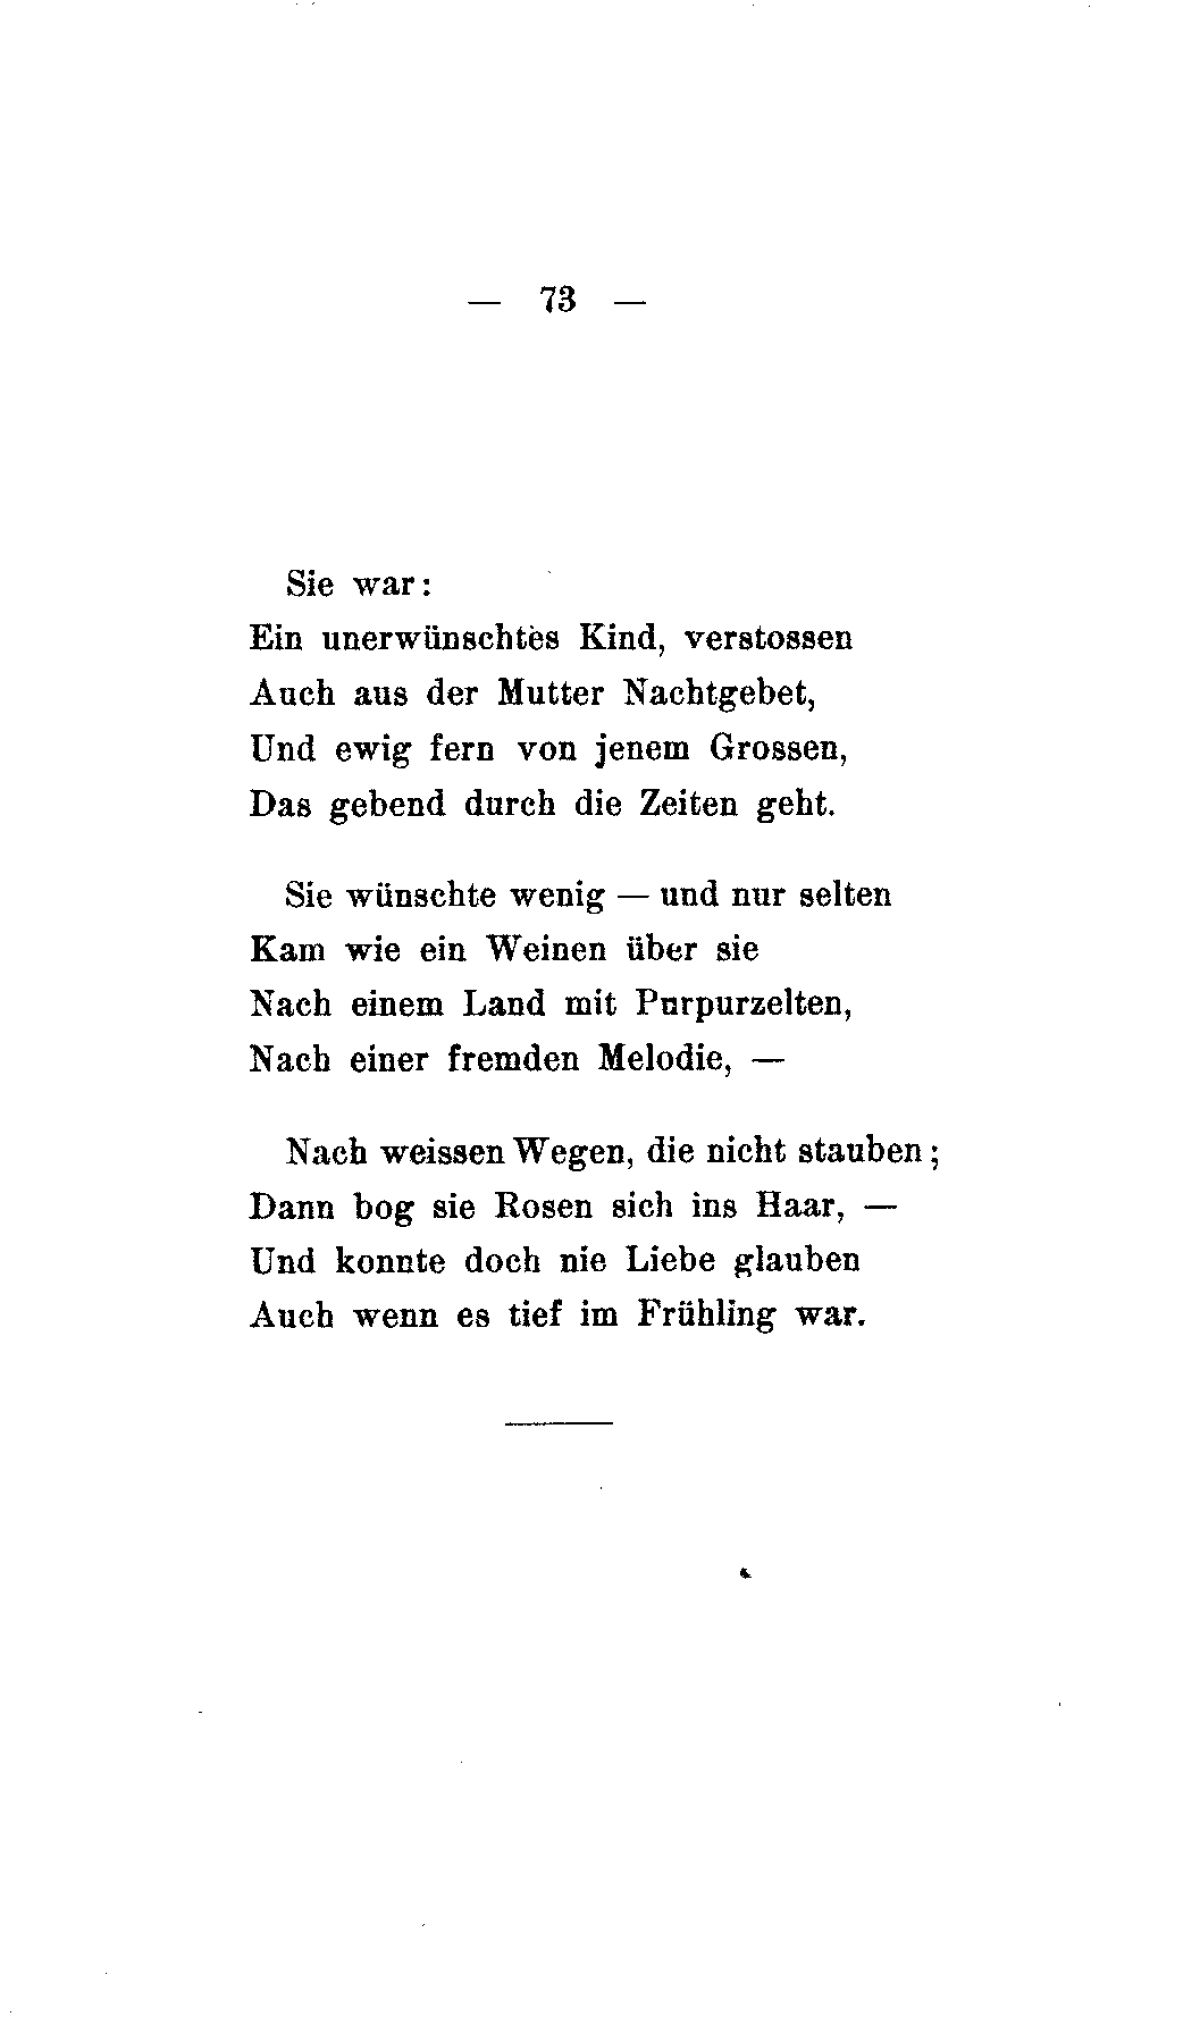 Advent Rainer Maria Rilke Rainer Maria Rilke Advent